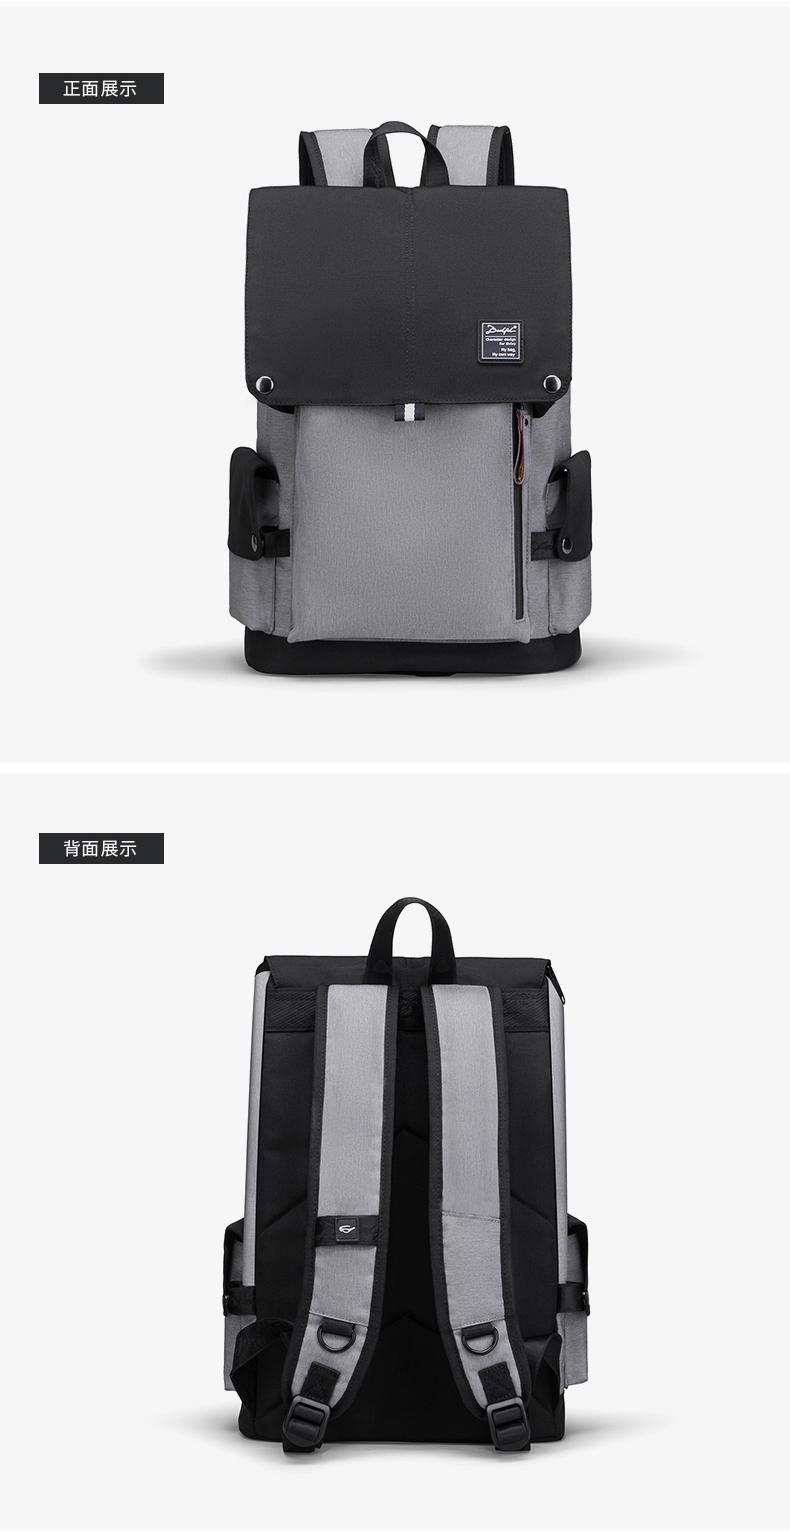 Casual backpack men's backpack fashion trend youth men's bag large capacity computer bag tide 20